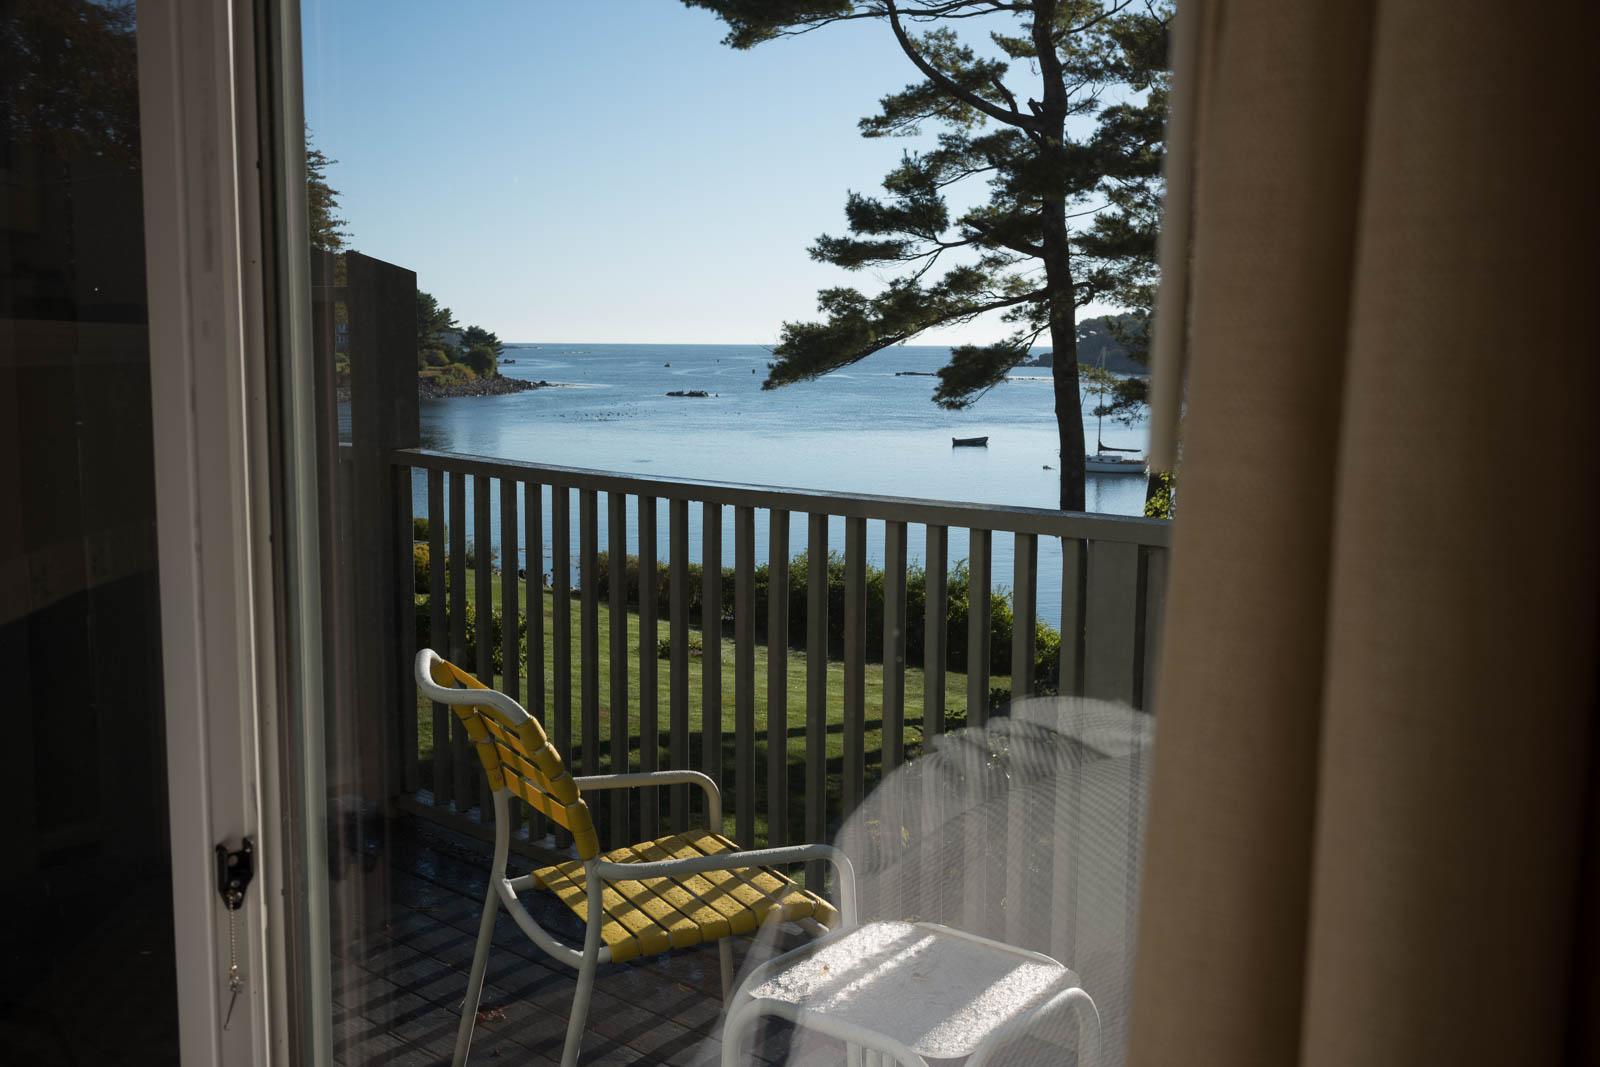 Room 23, Hotel Dockside Guest Quarters, York Maine